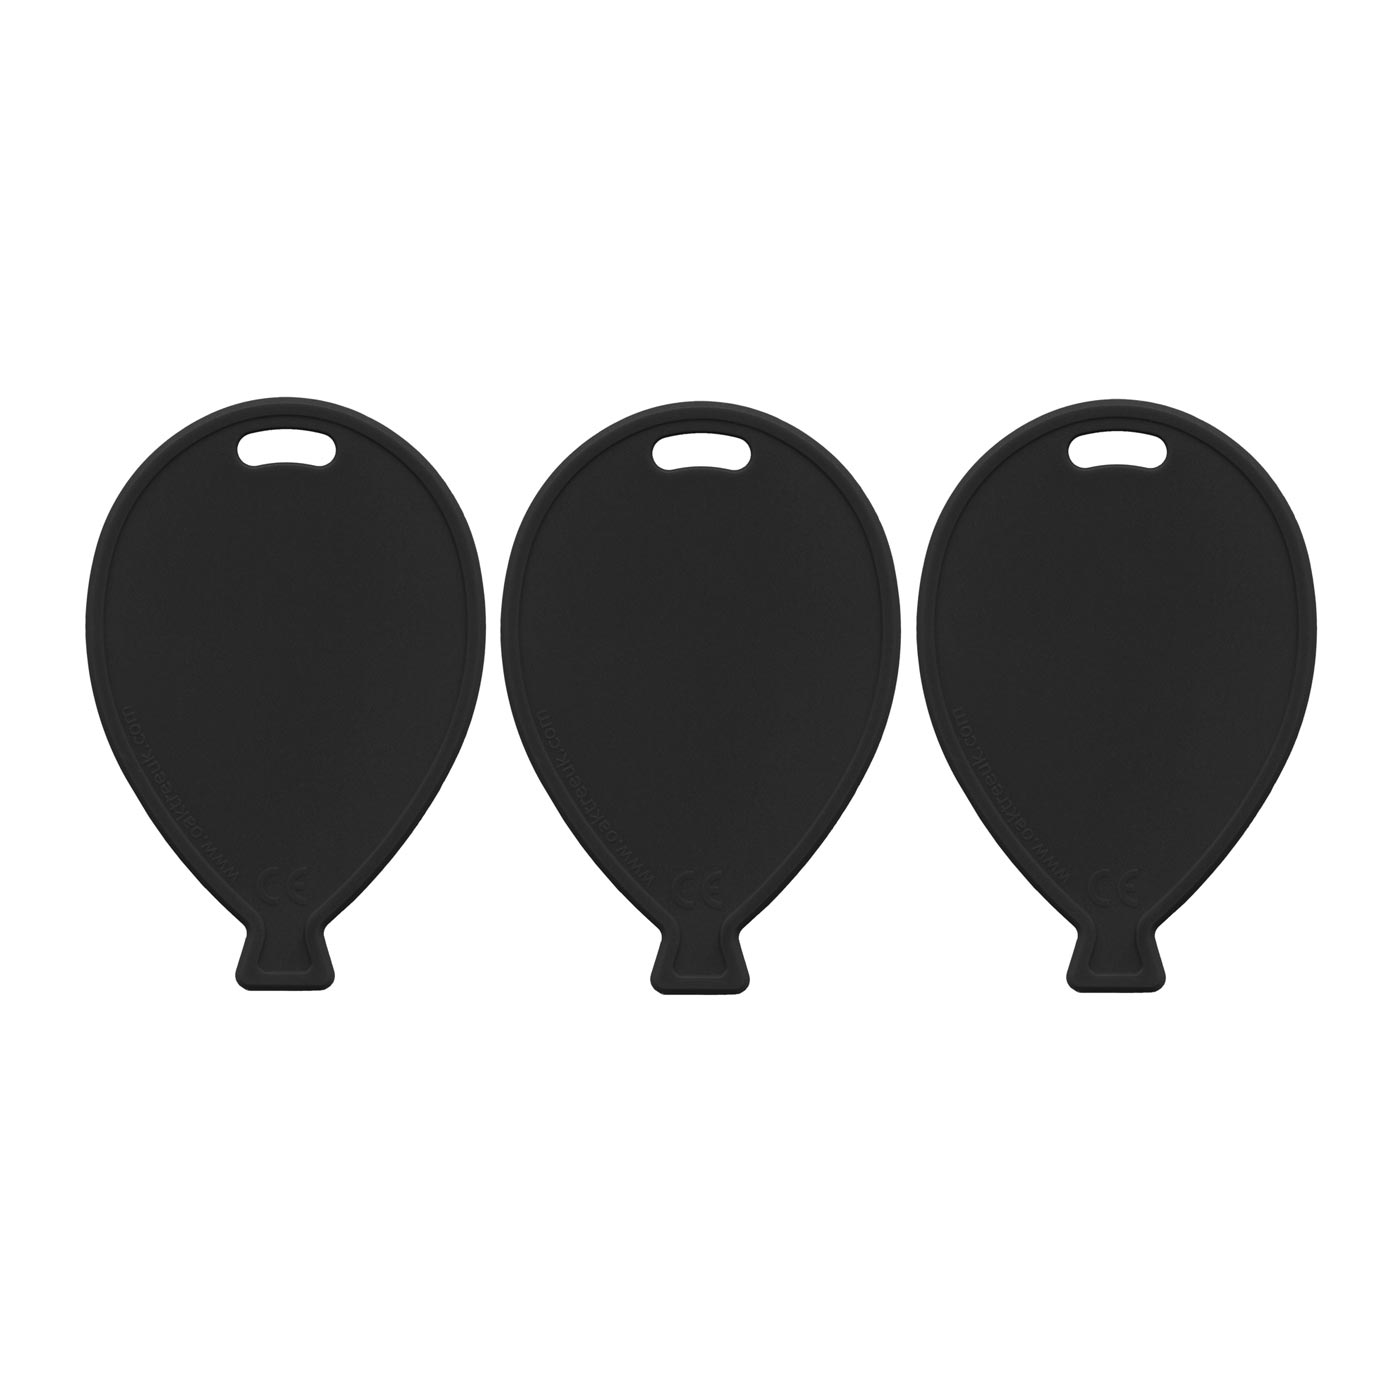 Black Balloon Weights